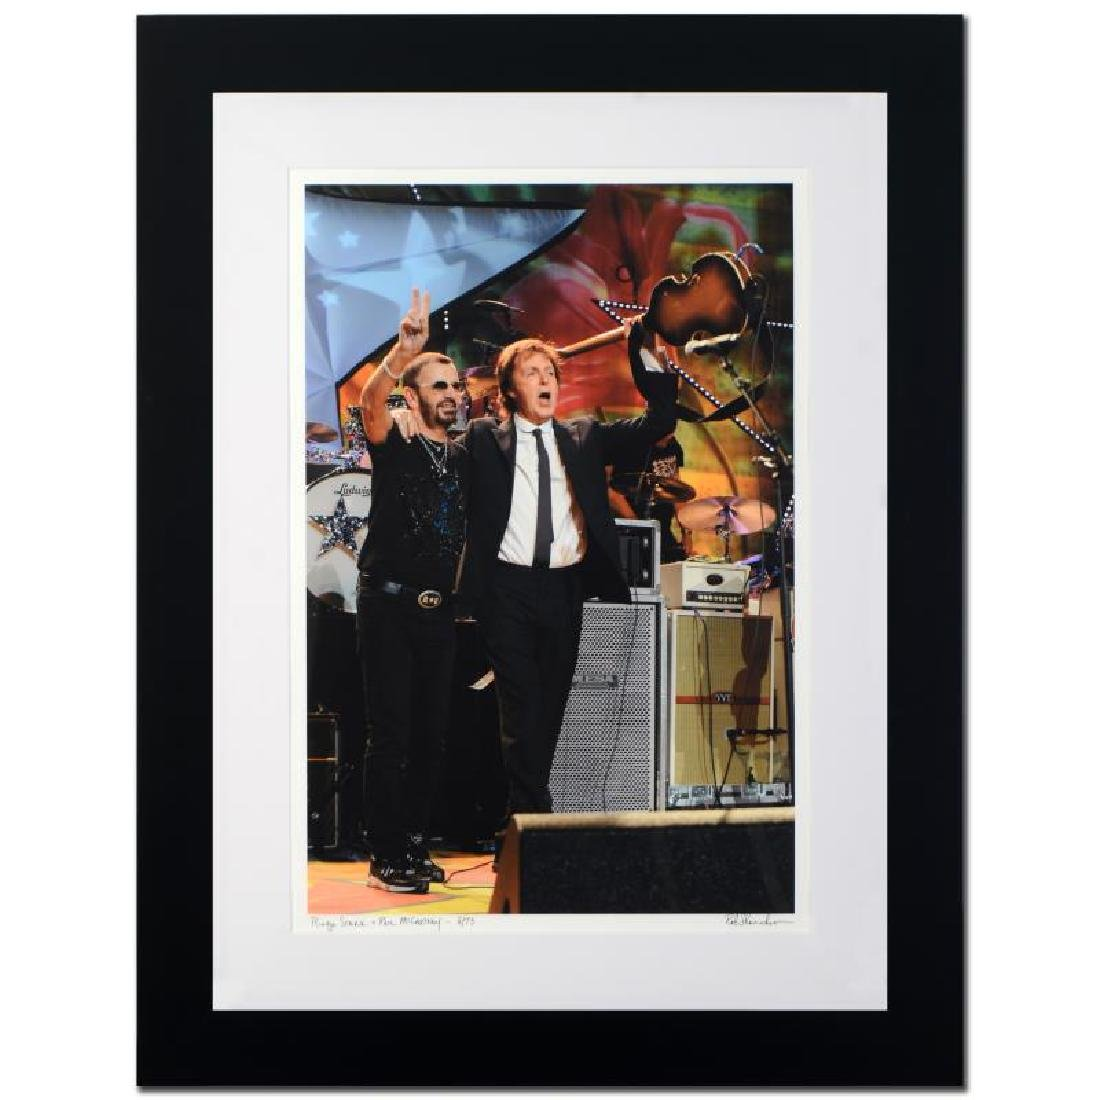 """Ringo Starr & Paul McCartney"" Limited Edition Giclee"